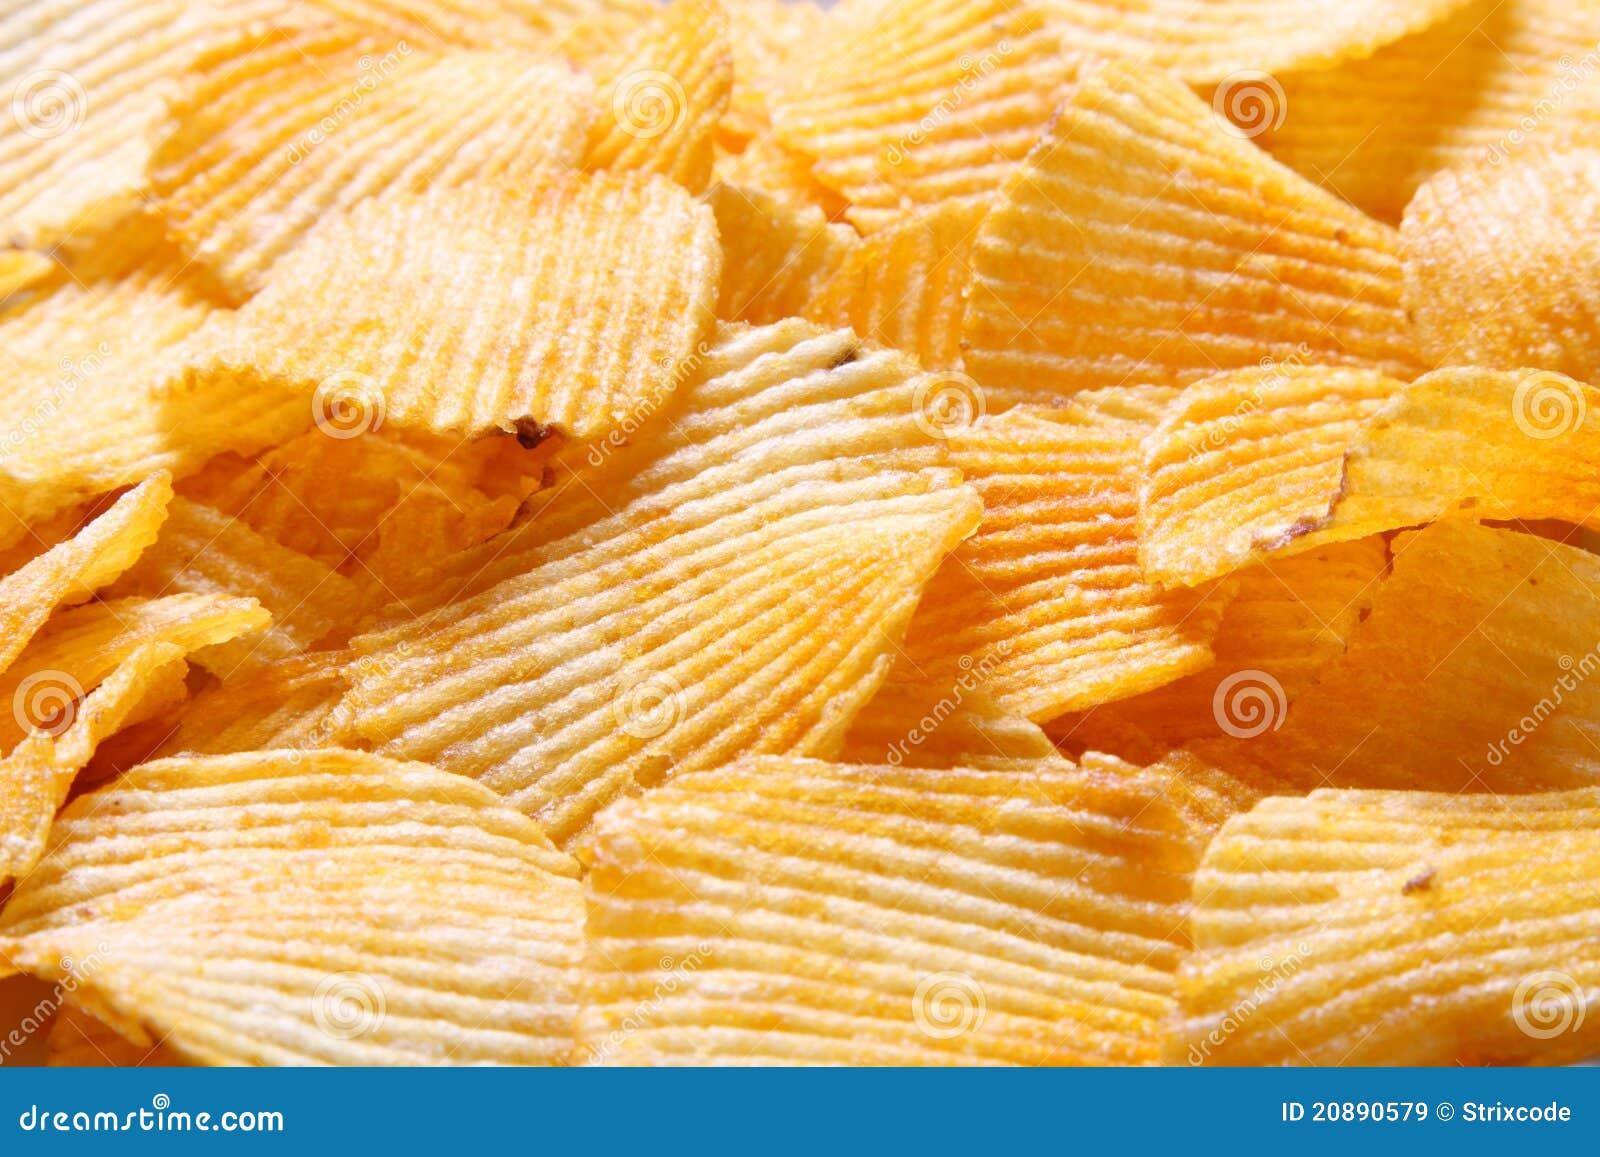 Image of potato chips background